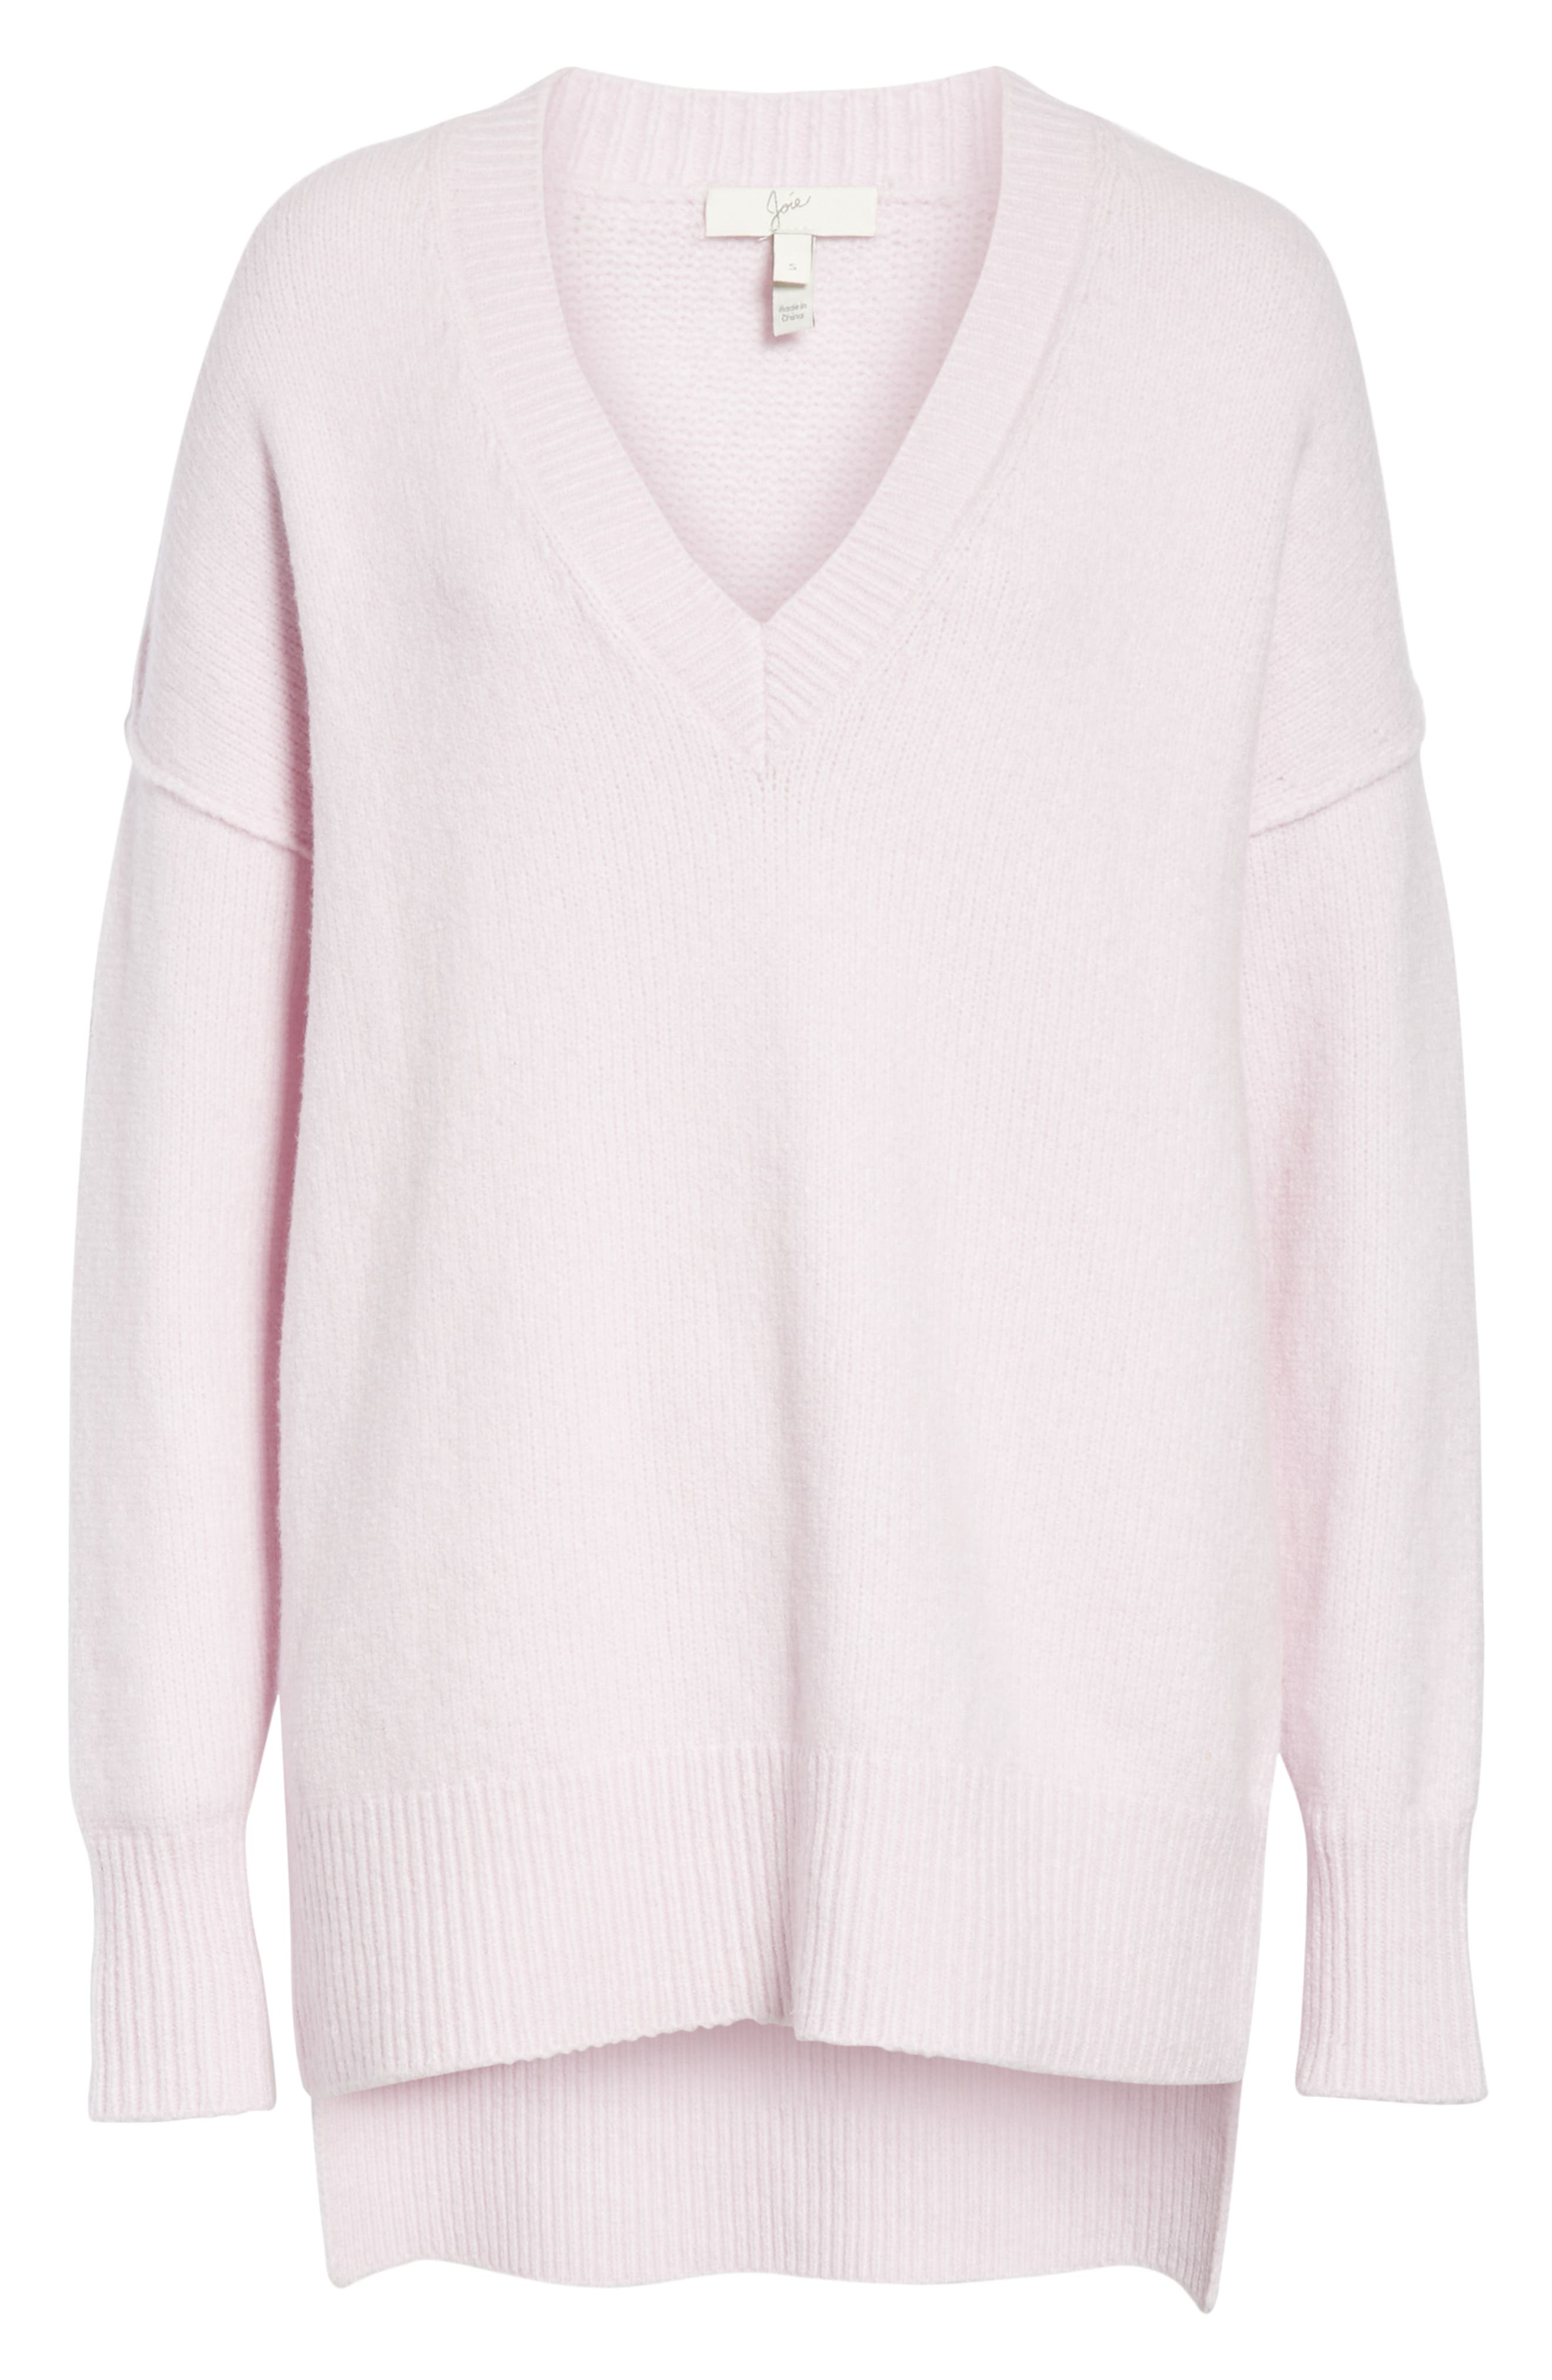 Joie Limana Seam Detail Wool Blend Sweater